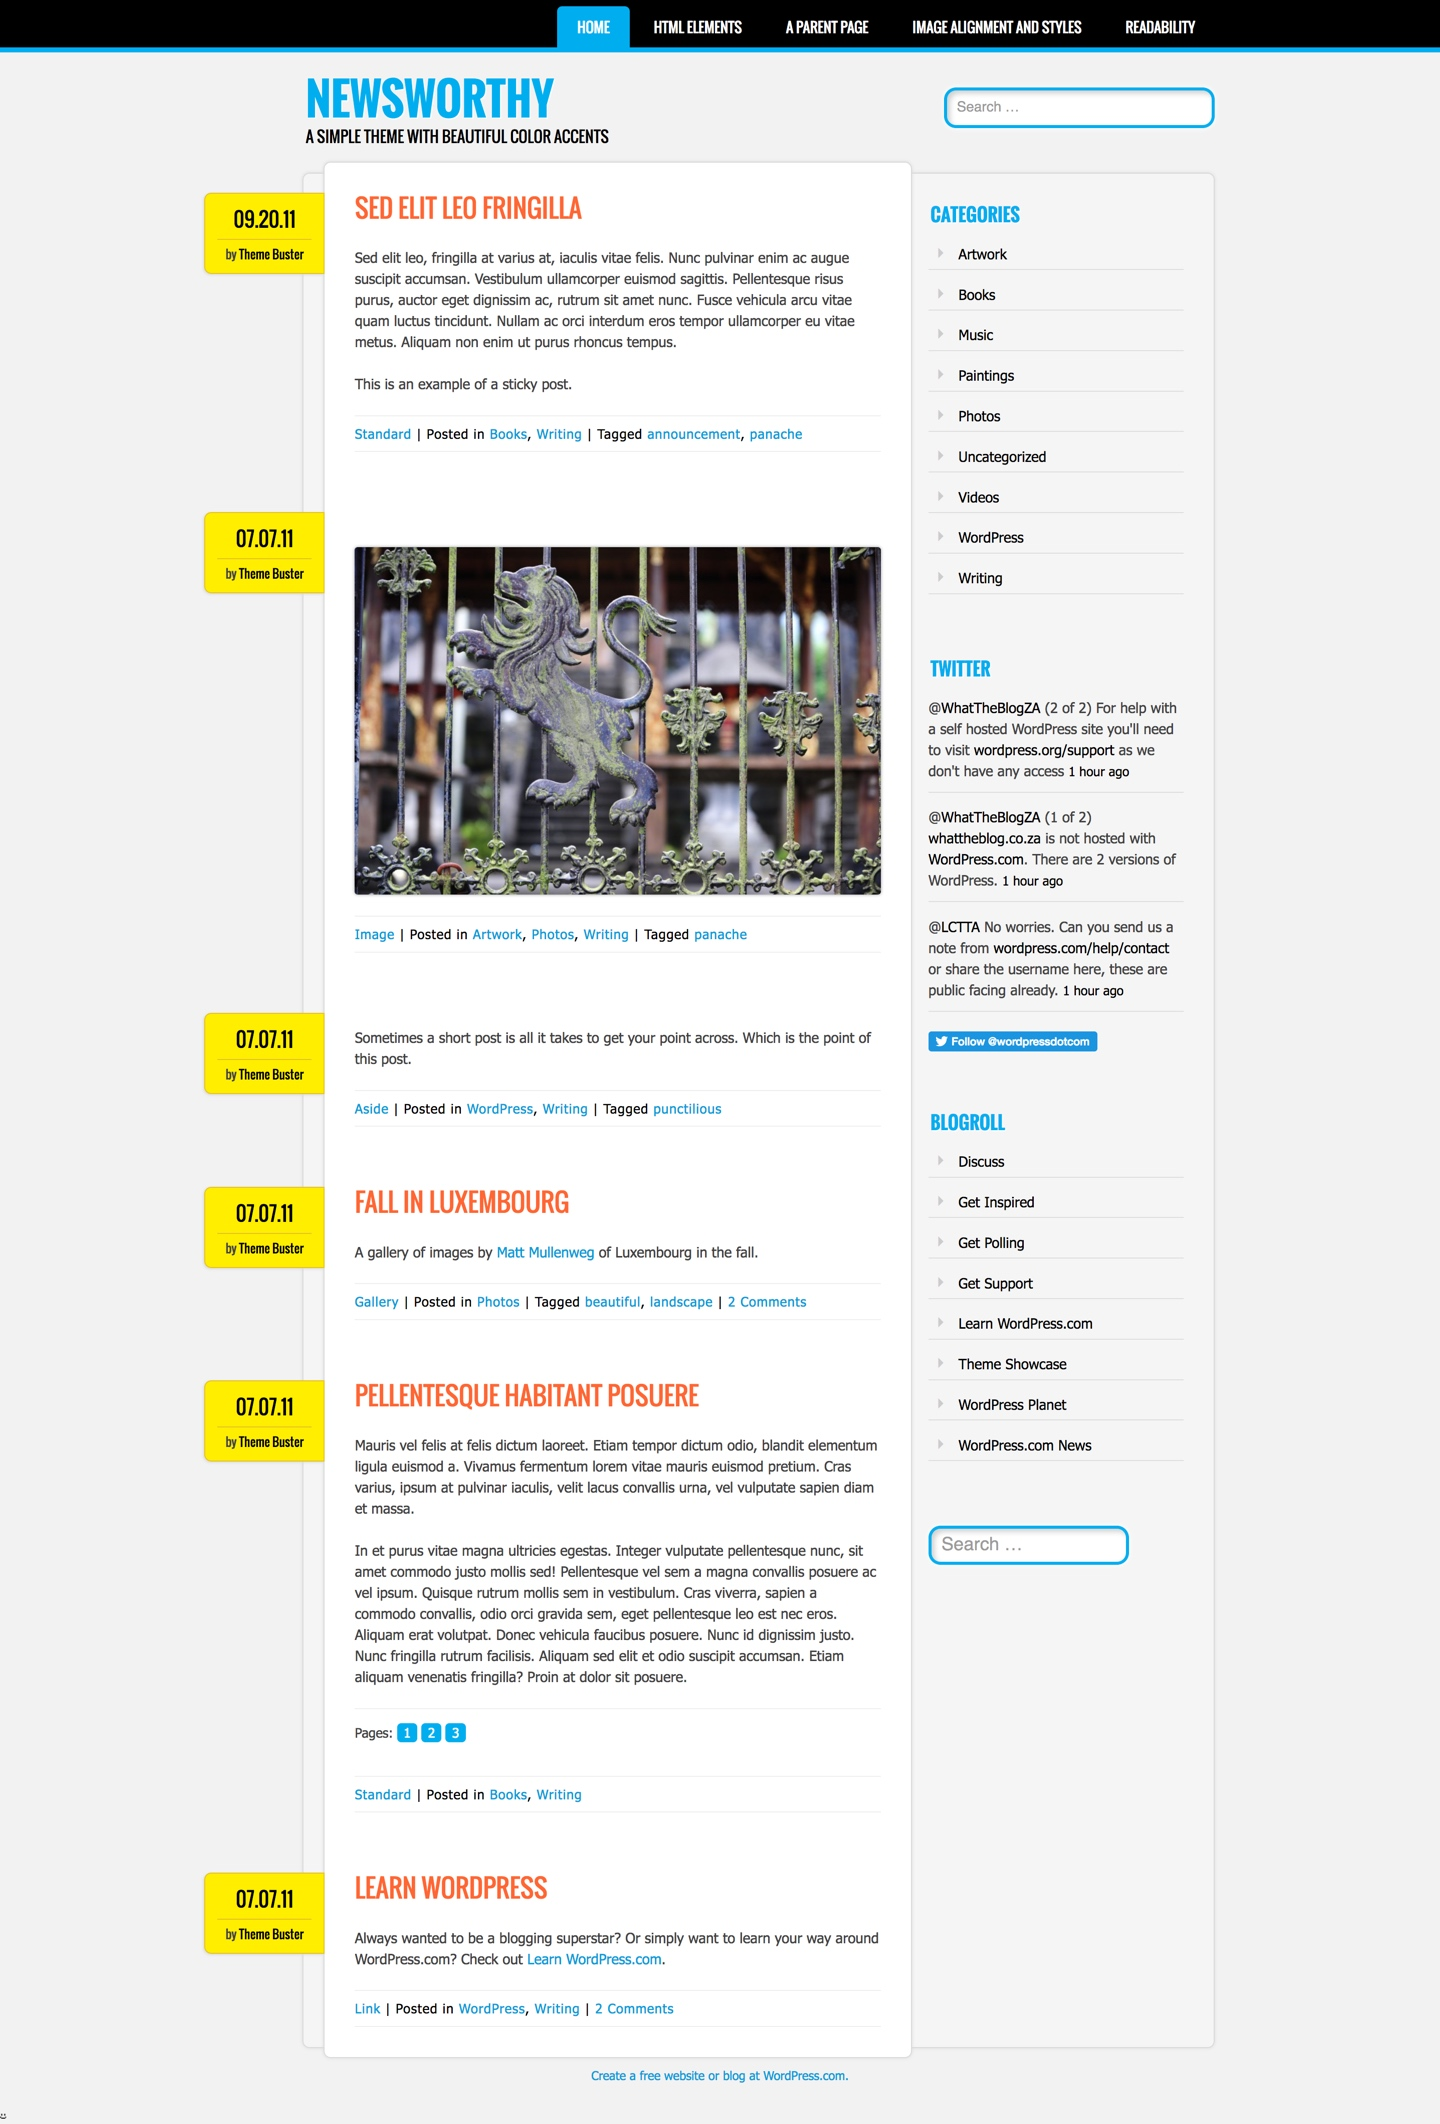 Screenshot of the Newsworthy theme